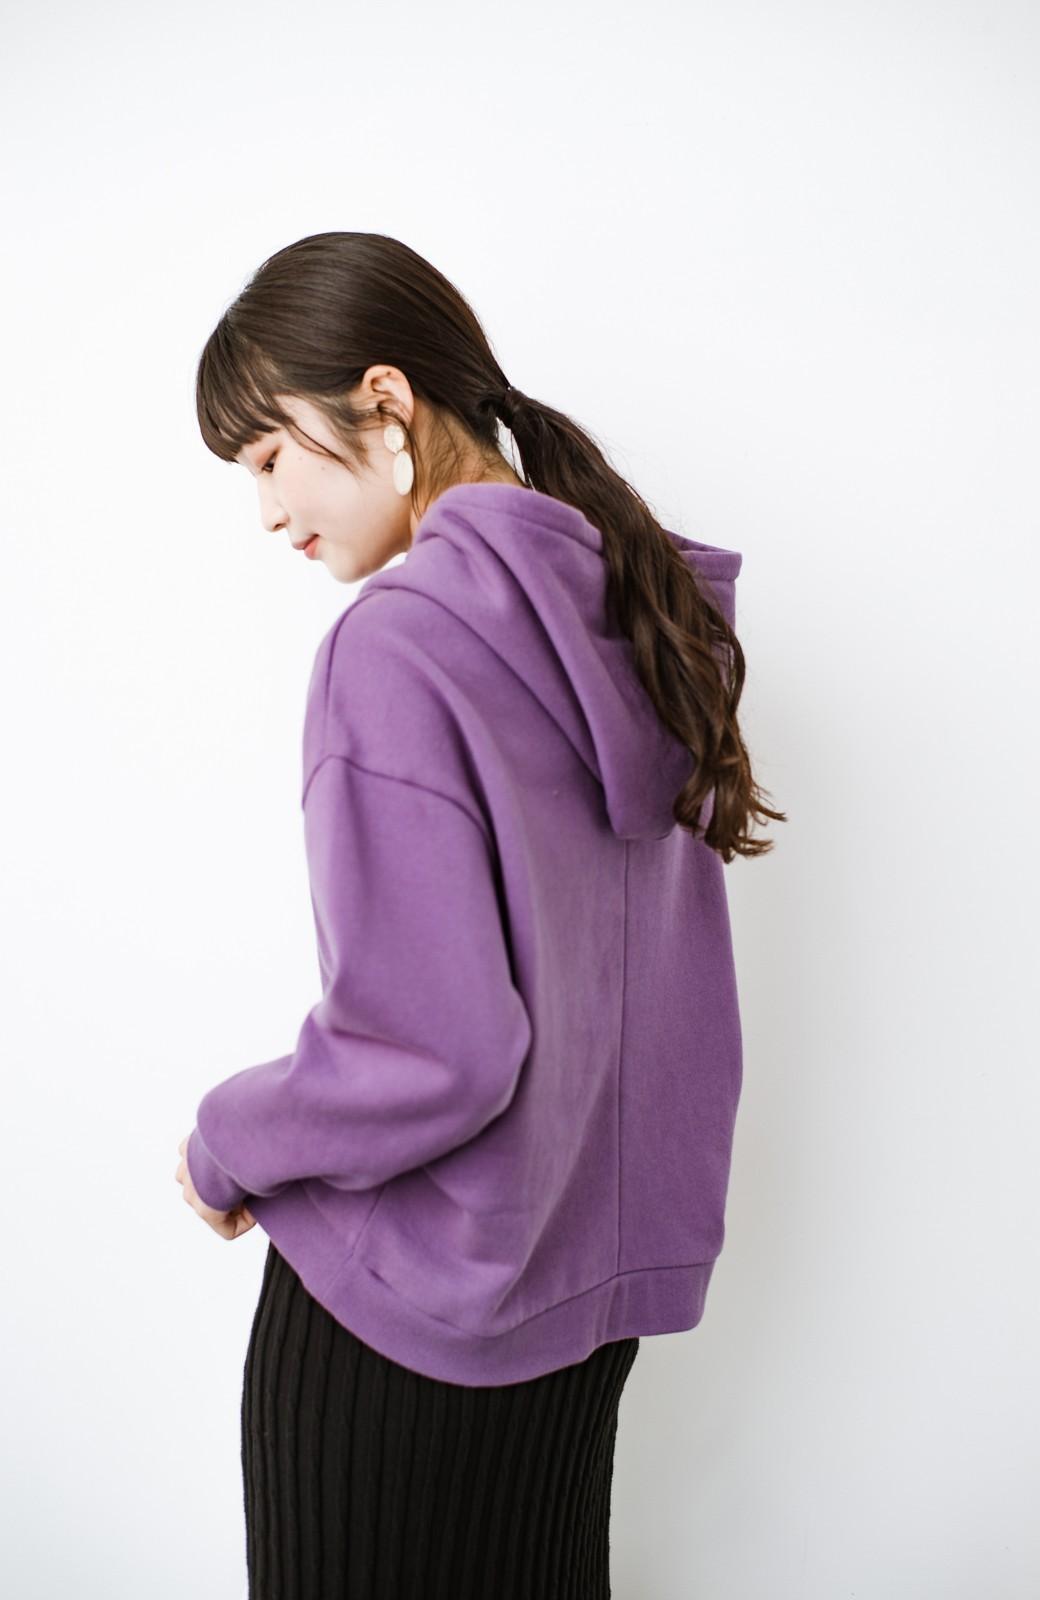 haco! PBPオーガニックコットン 短め丈でバランスよく着られる裏起毛パーカー <パープル>の商品写真4